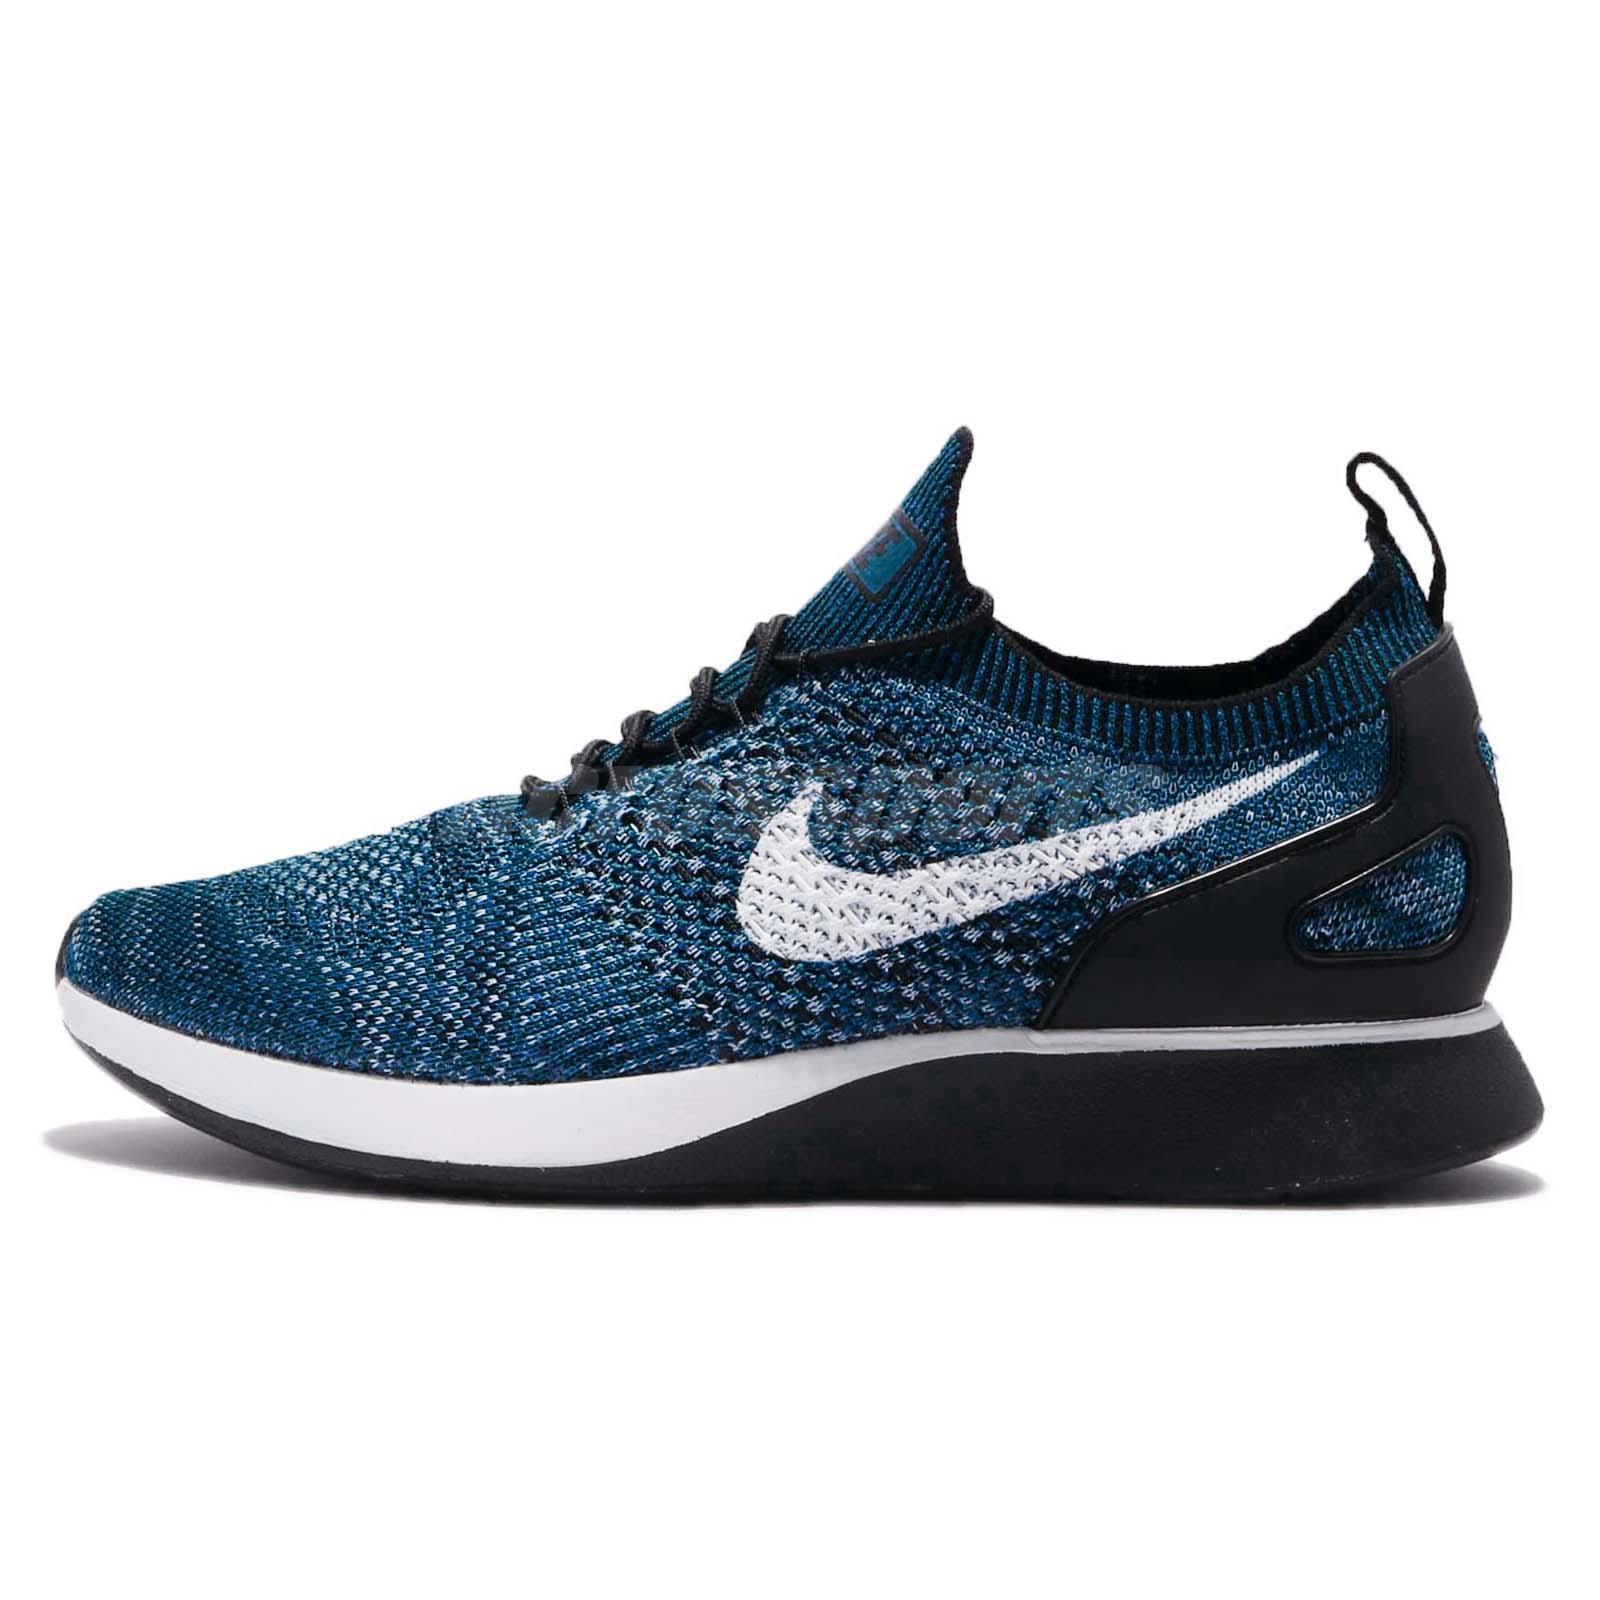 buy popular 11d27 87b5c Nike Air Zoom Mariah Flyknit Racer Cirrus Blue Navy Black Men Running  918264-300